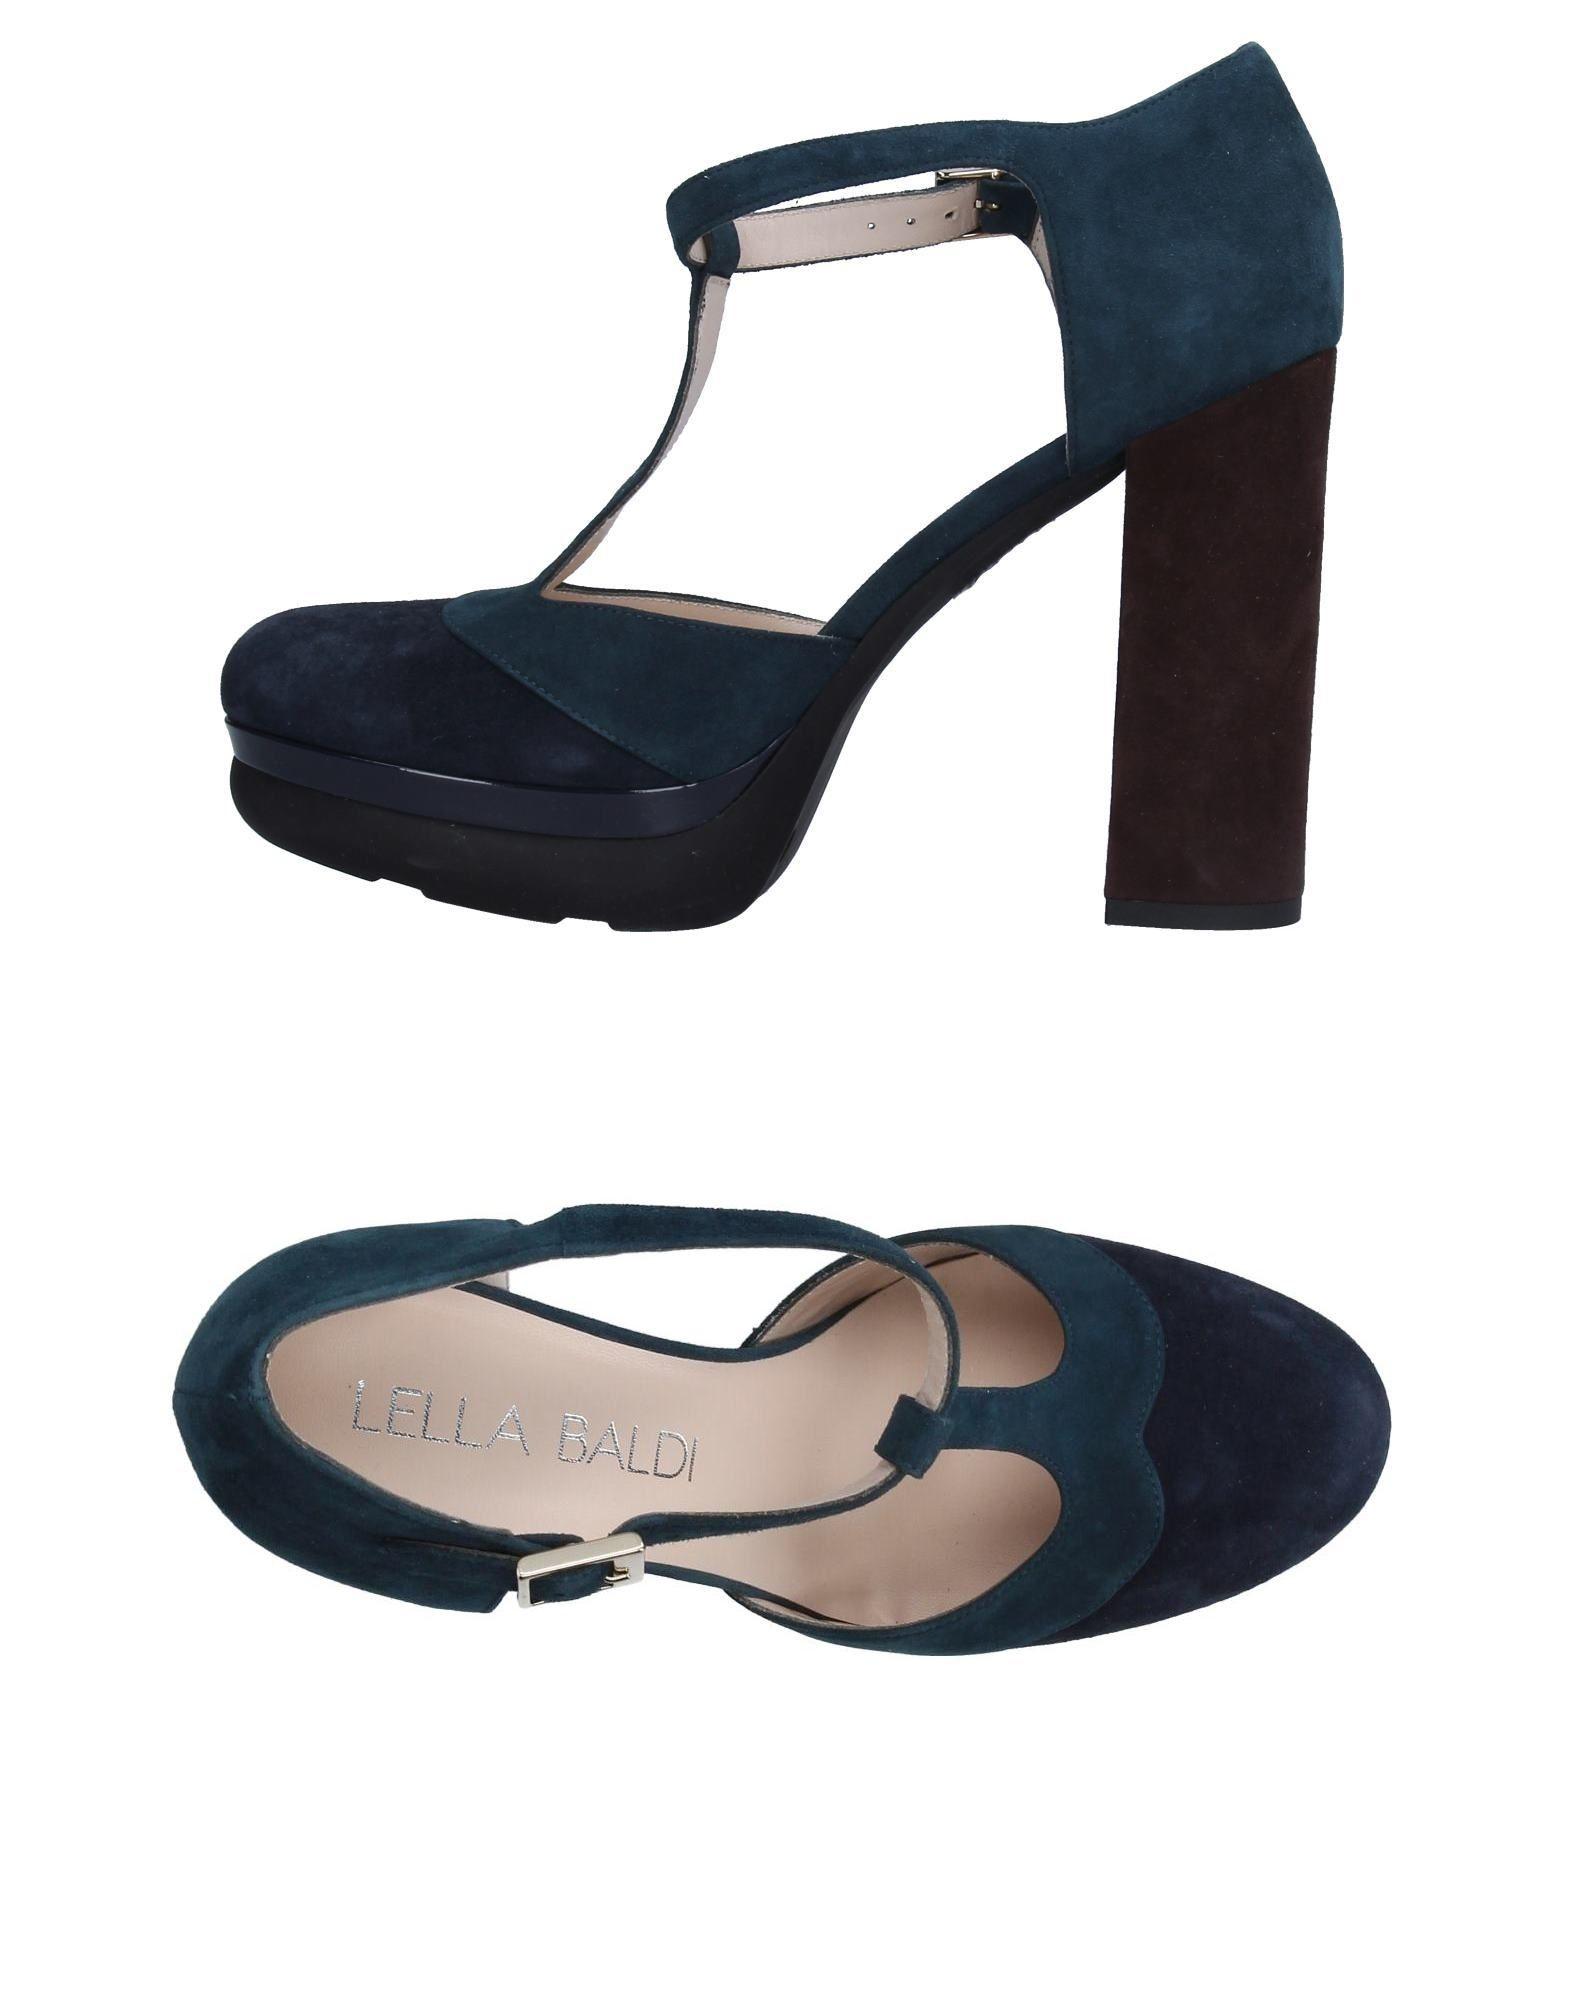 Gut um Baldi billige Schuhe zu tragenLella Baldi um Pumps Damen  11259539NP 282f4c